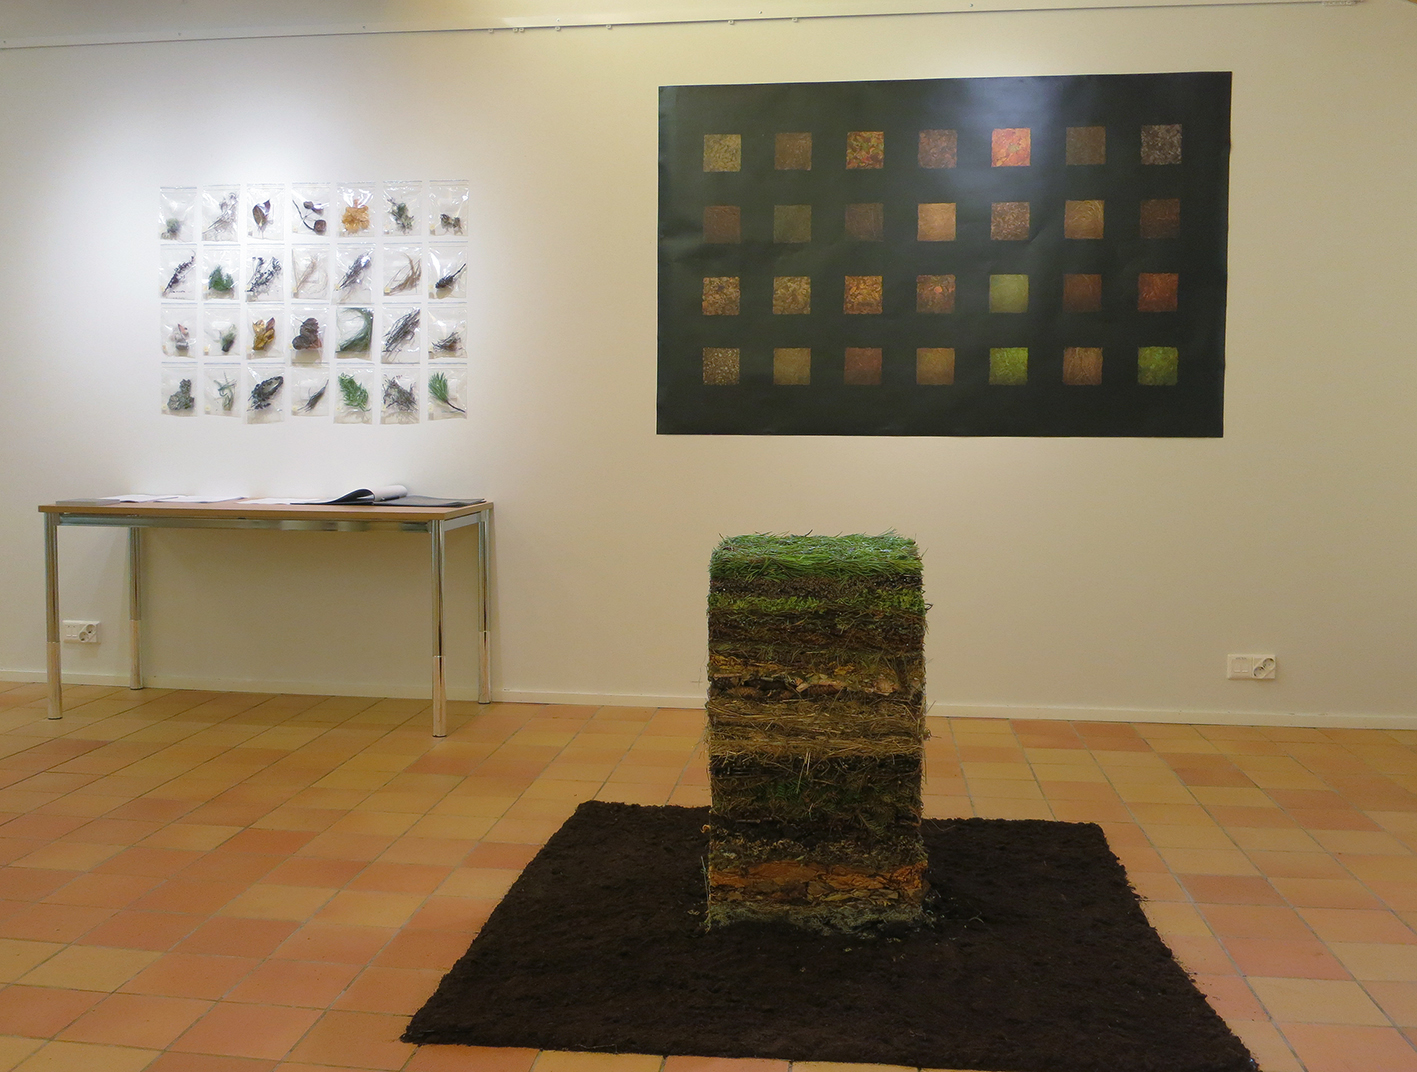 Exhibition in Finland